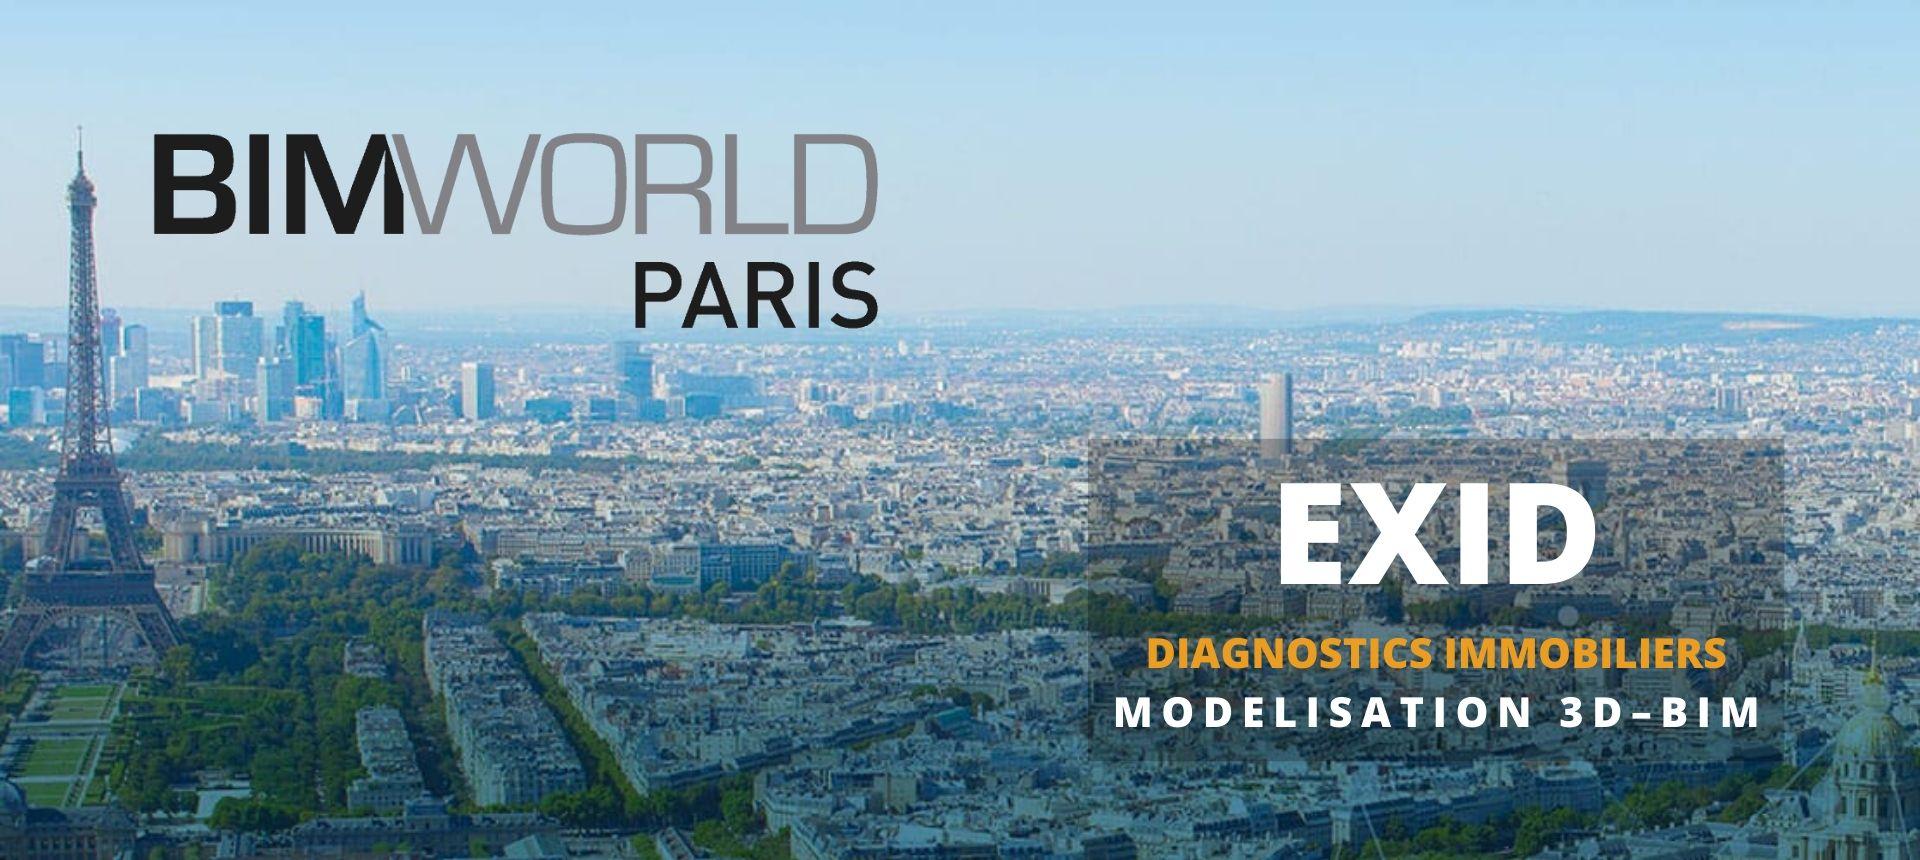 BIM World paris 2020 - Exid Diagnostic